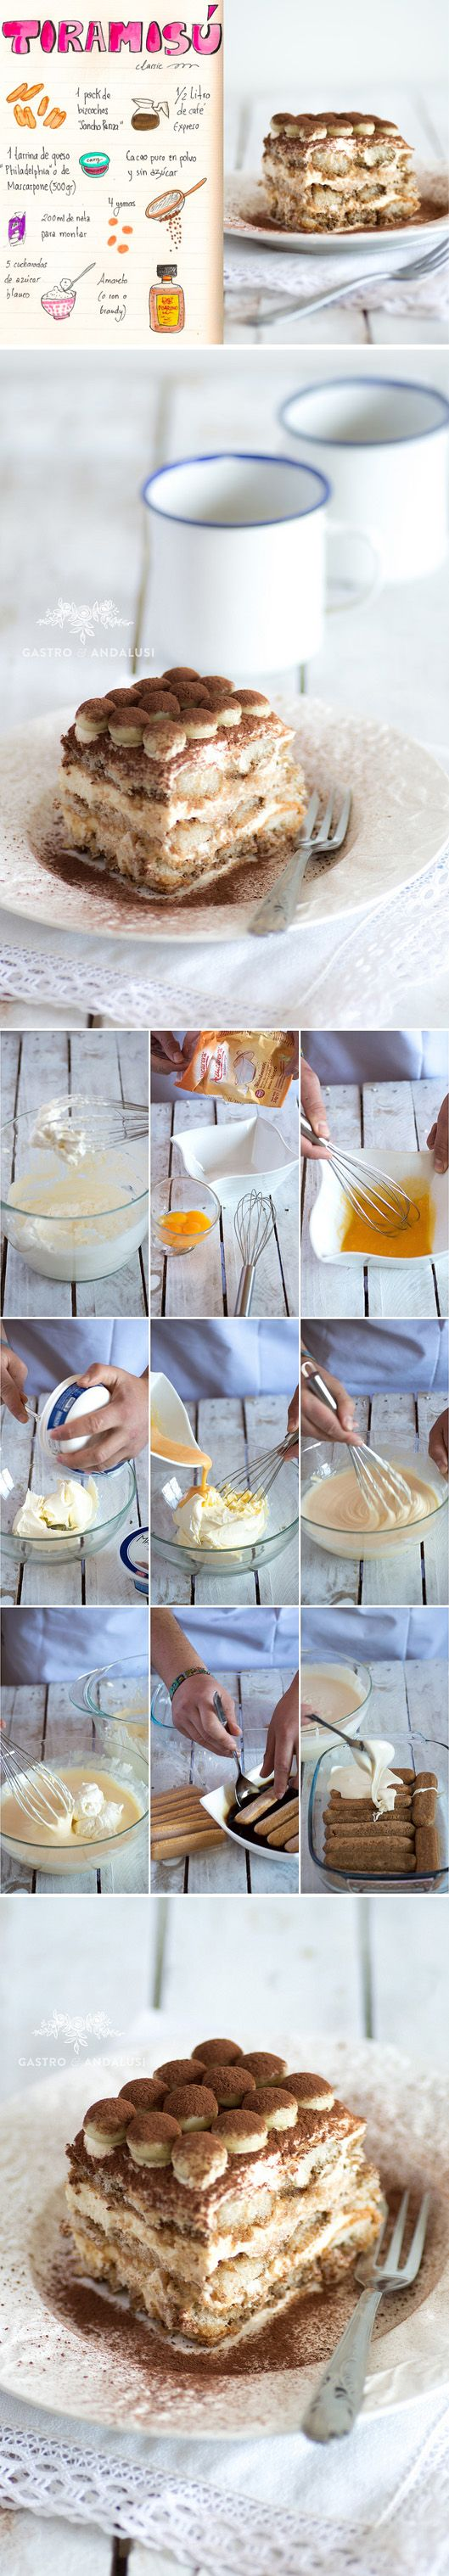 Tiramisú con galletas savoiardi y chocolate blanco / http://www.gastroandalusi.com/